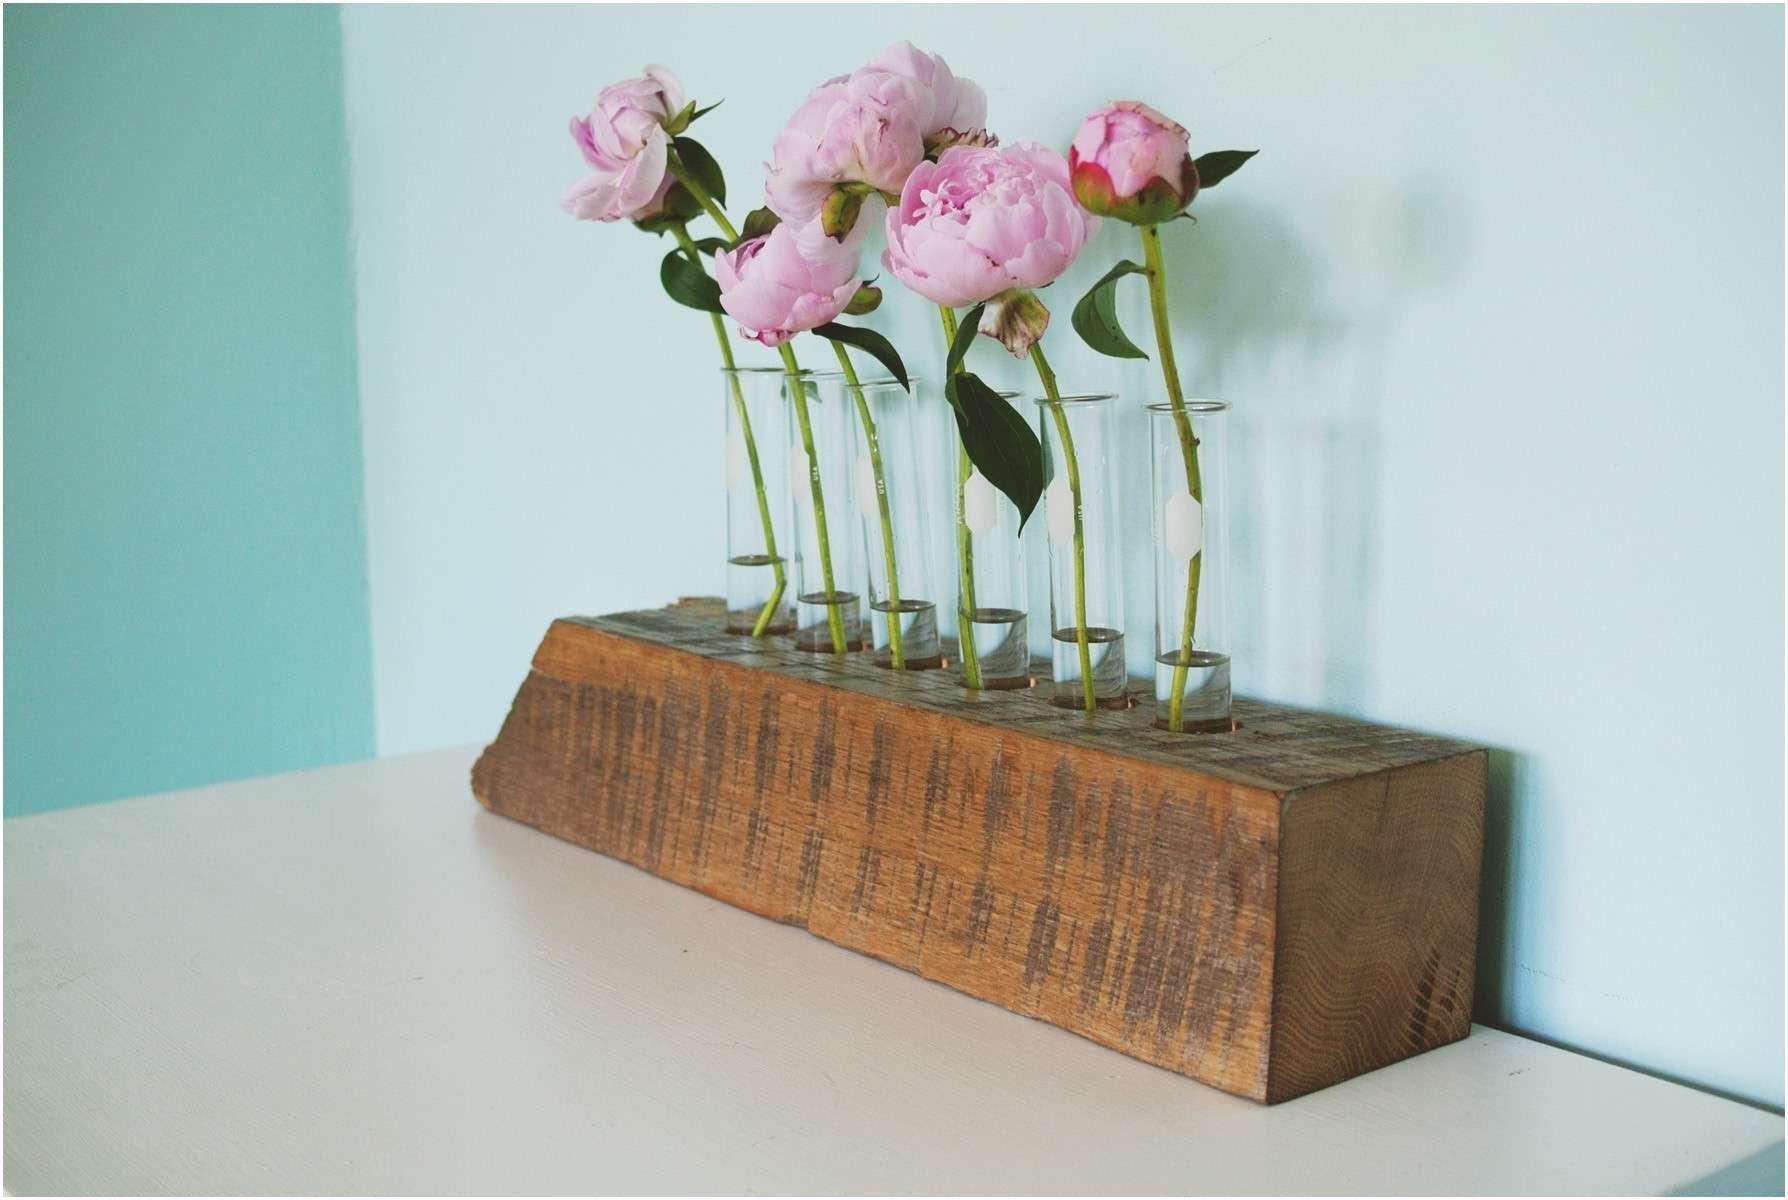 tulip vase ideas of flower arrangement in vase lovely flower arrangements staggering with regard to flower arrangement in vase lovely flower arrangements staggering vases vase for e flower shaffa i 0d